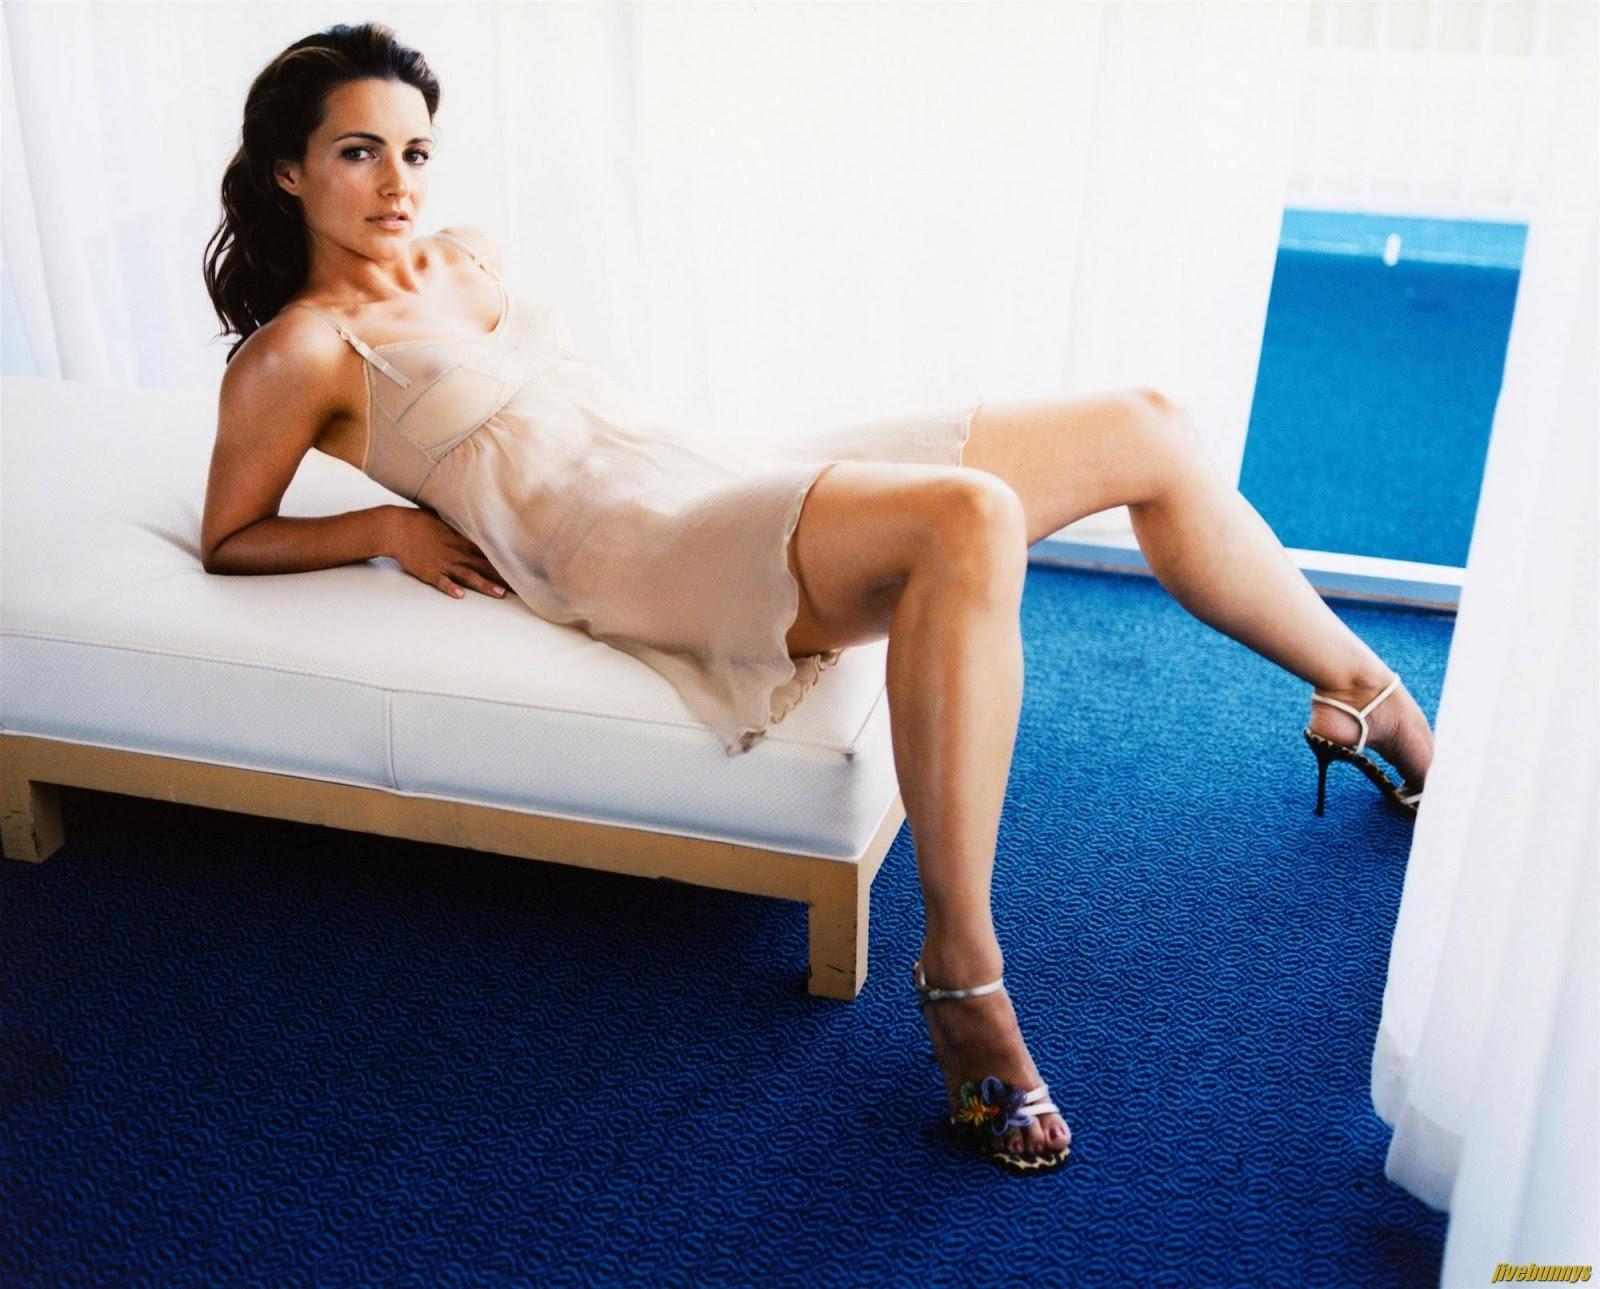 Nude Pictures Of Kristin Davis 80